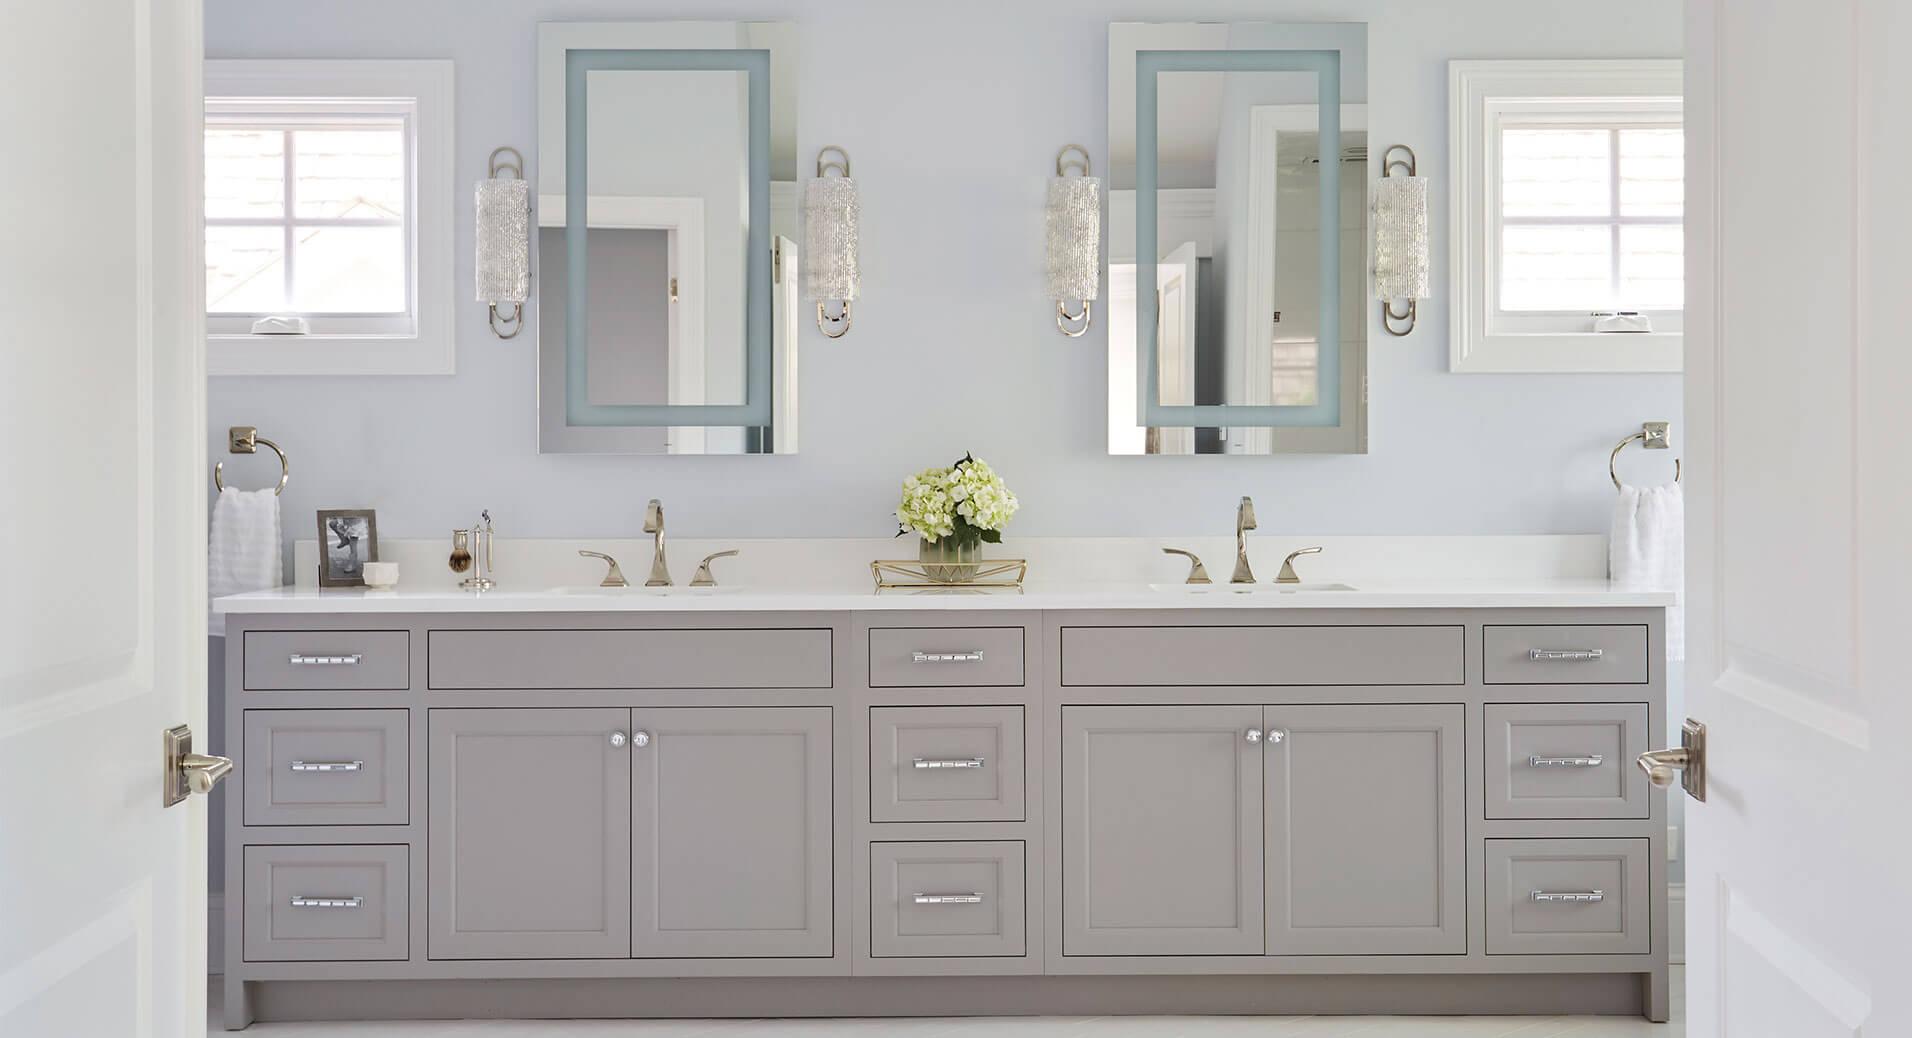 Kitchen Bathroom Cabinets Woodharbor Custom Cabinetry